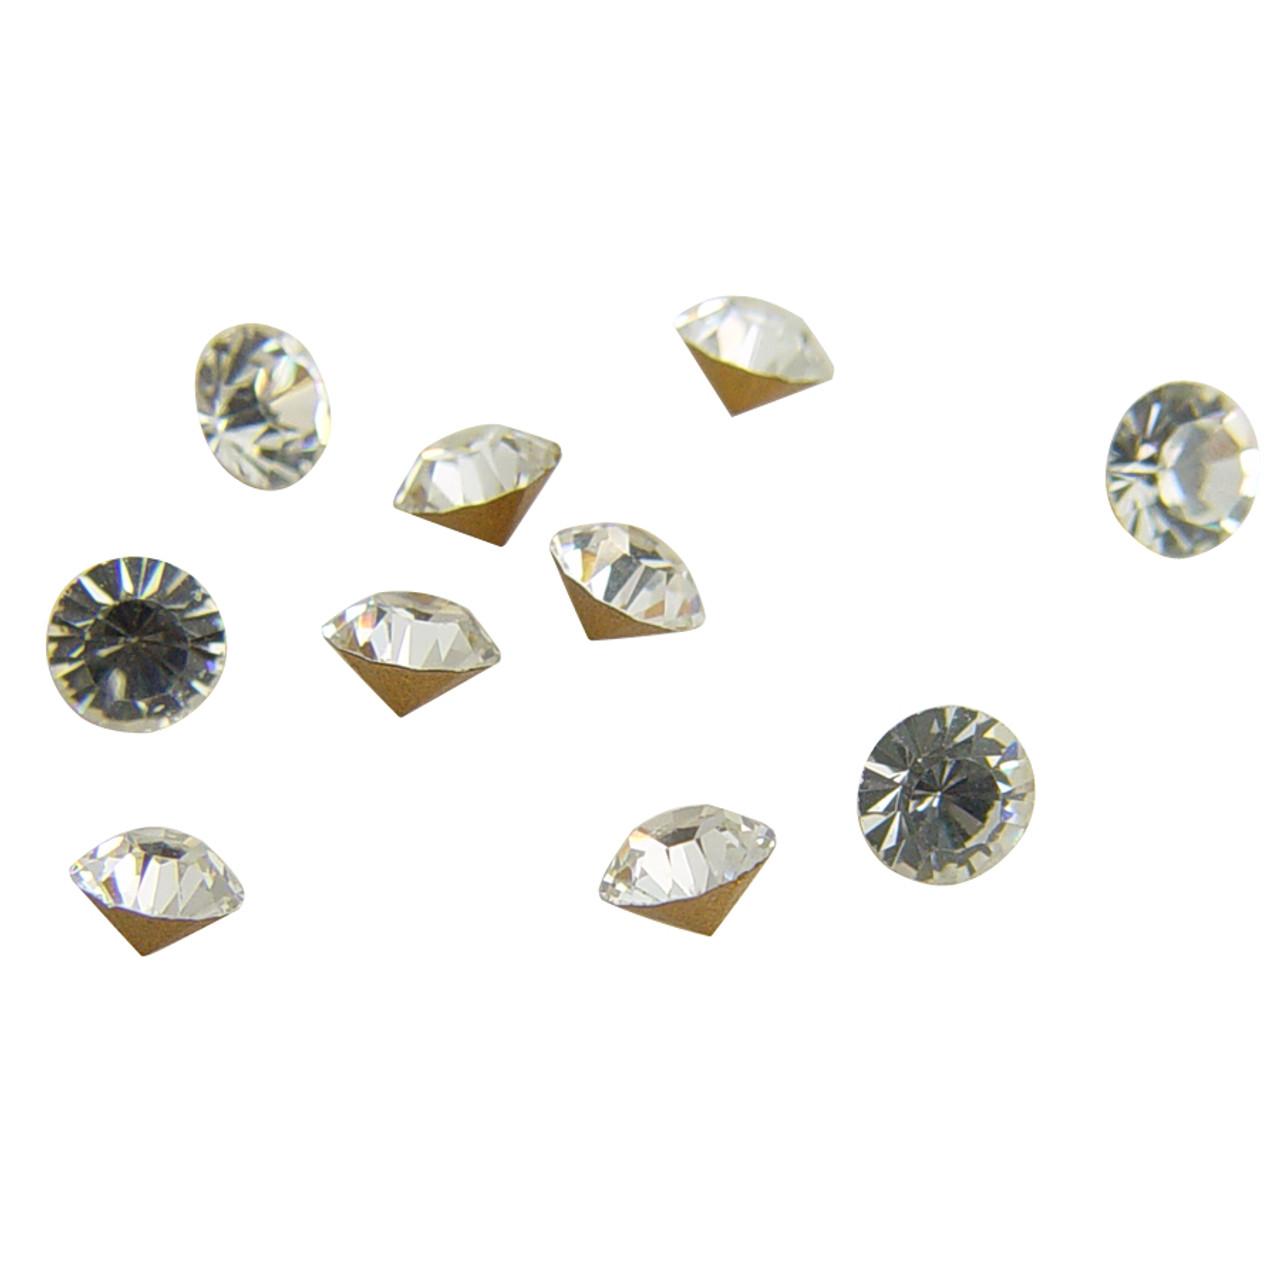 d82b16493277b1 Swarovski Stones Clear White Austrian Crystals